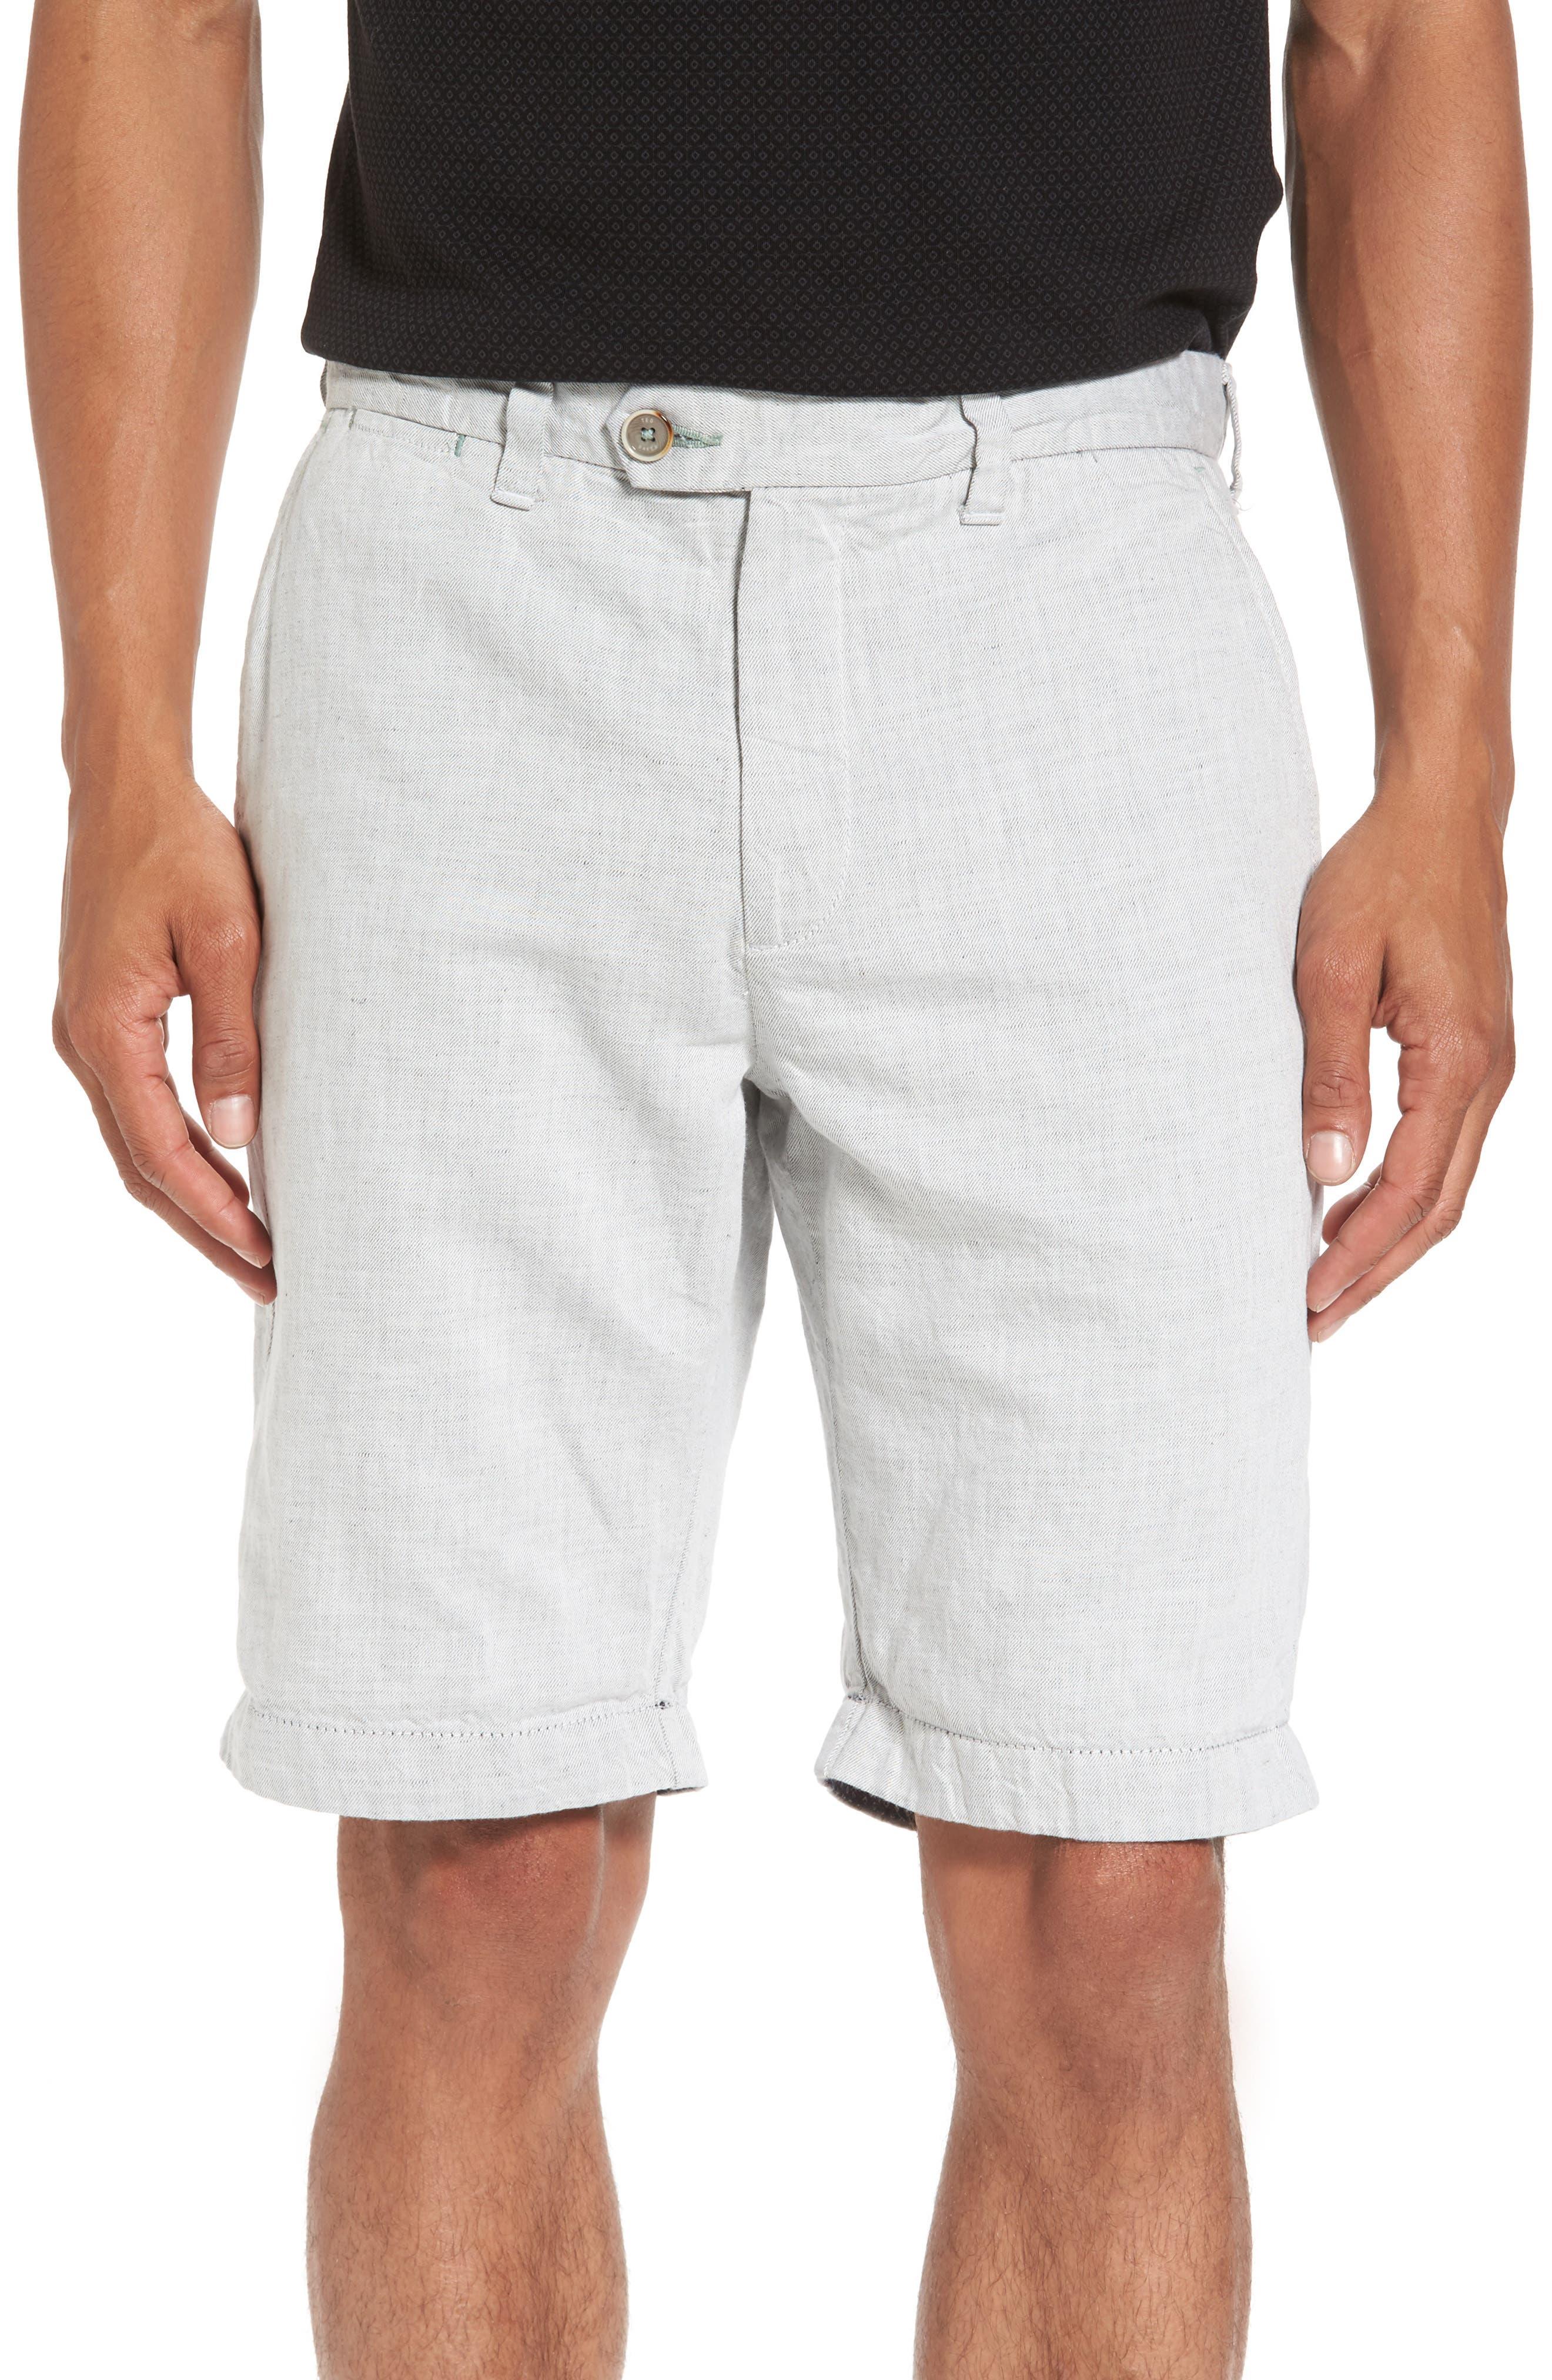 Frisho Cuff Denim Shorts,                             Main thumbnail 1, color,